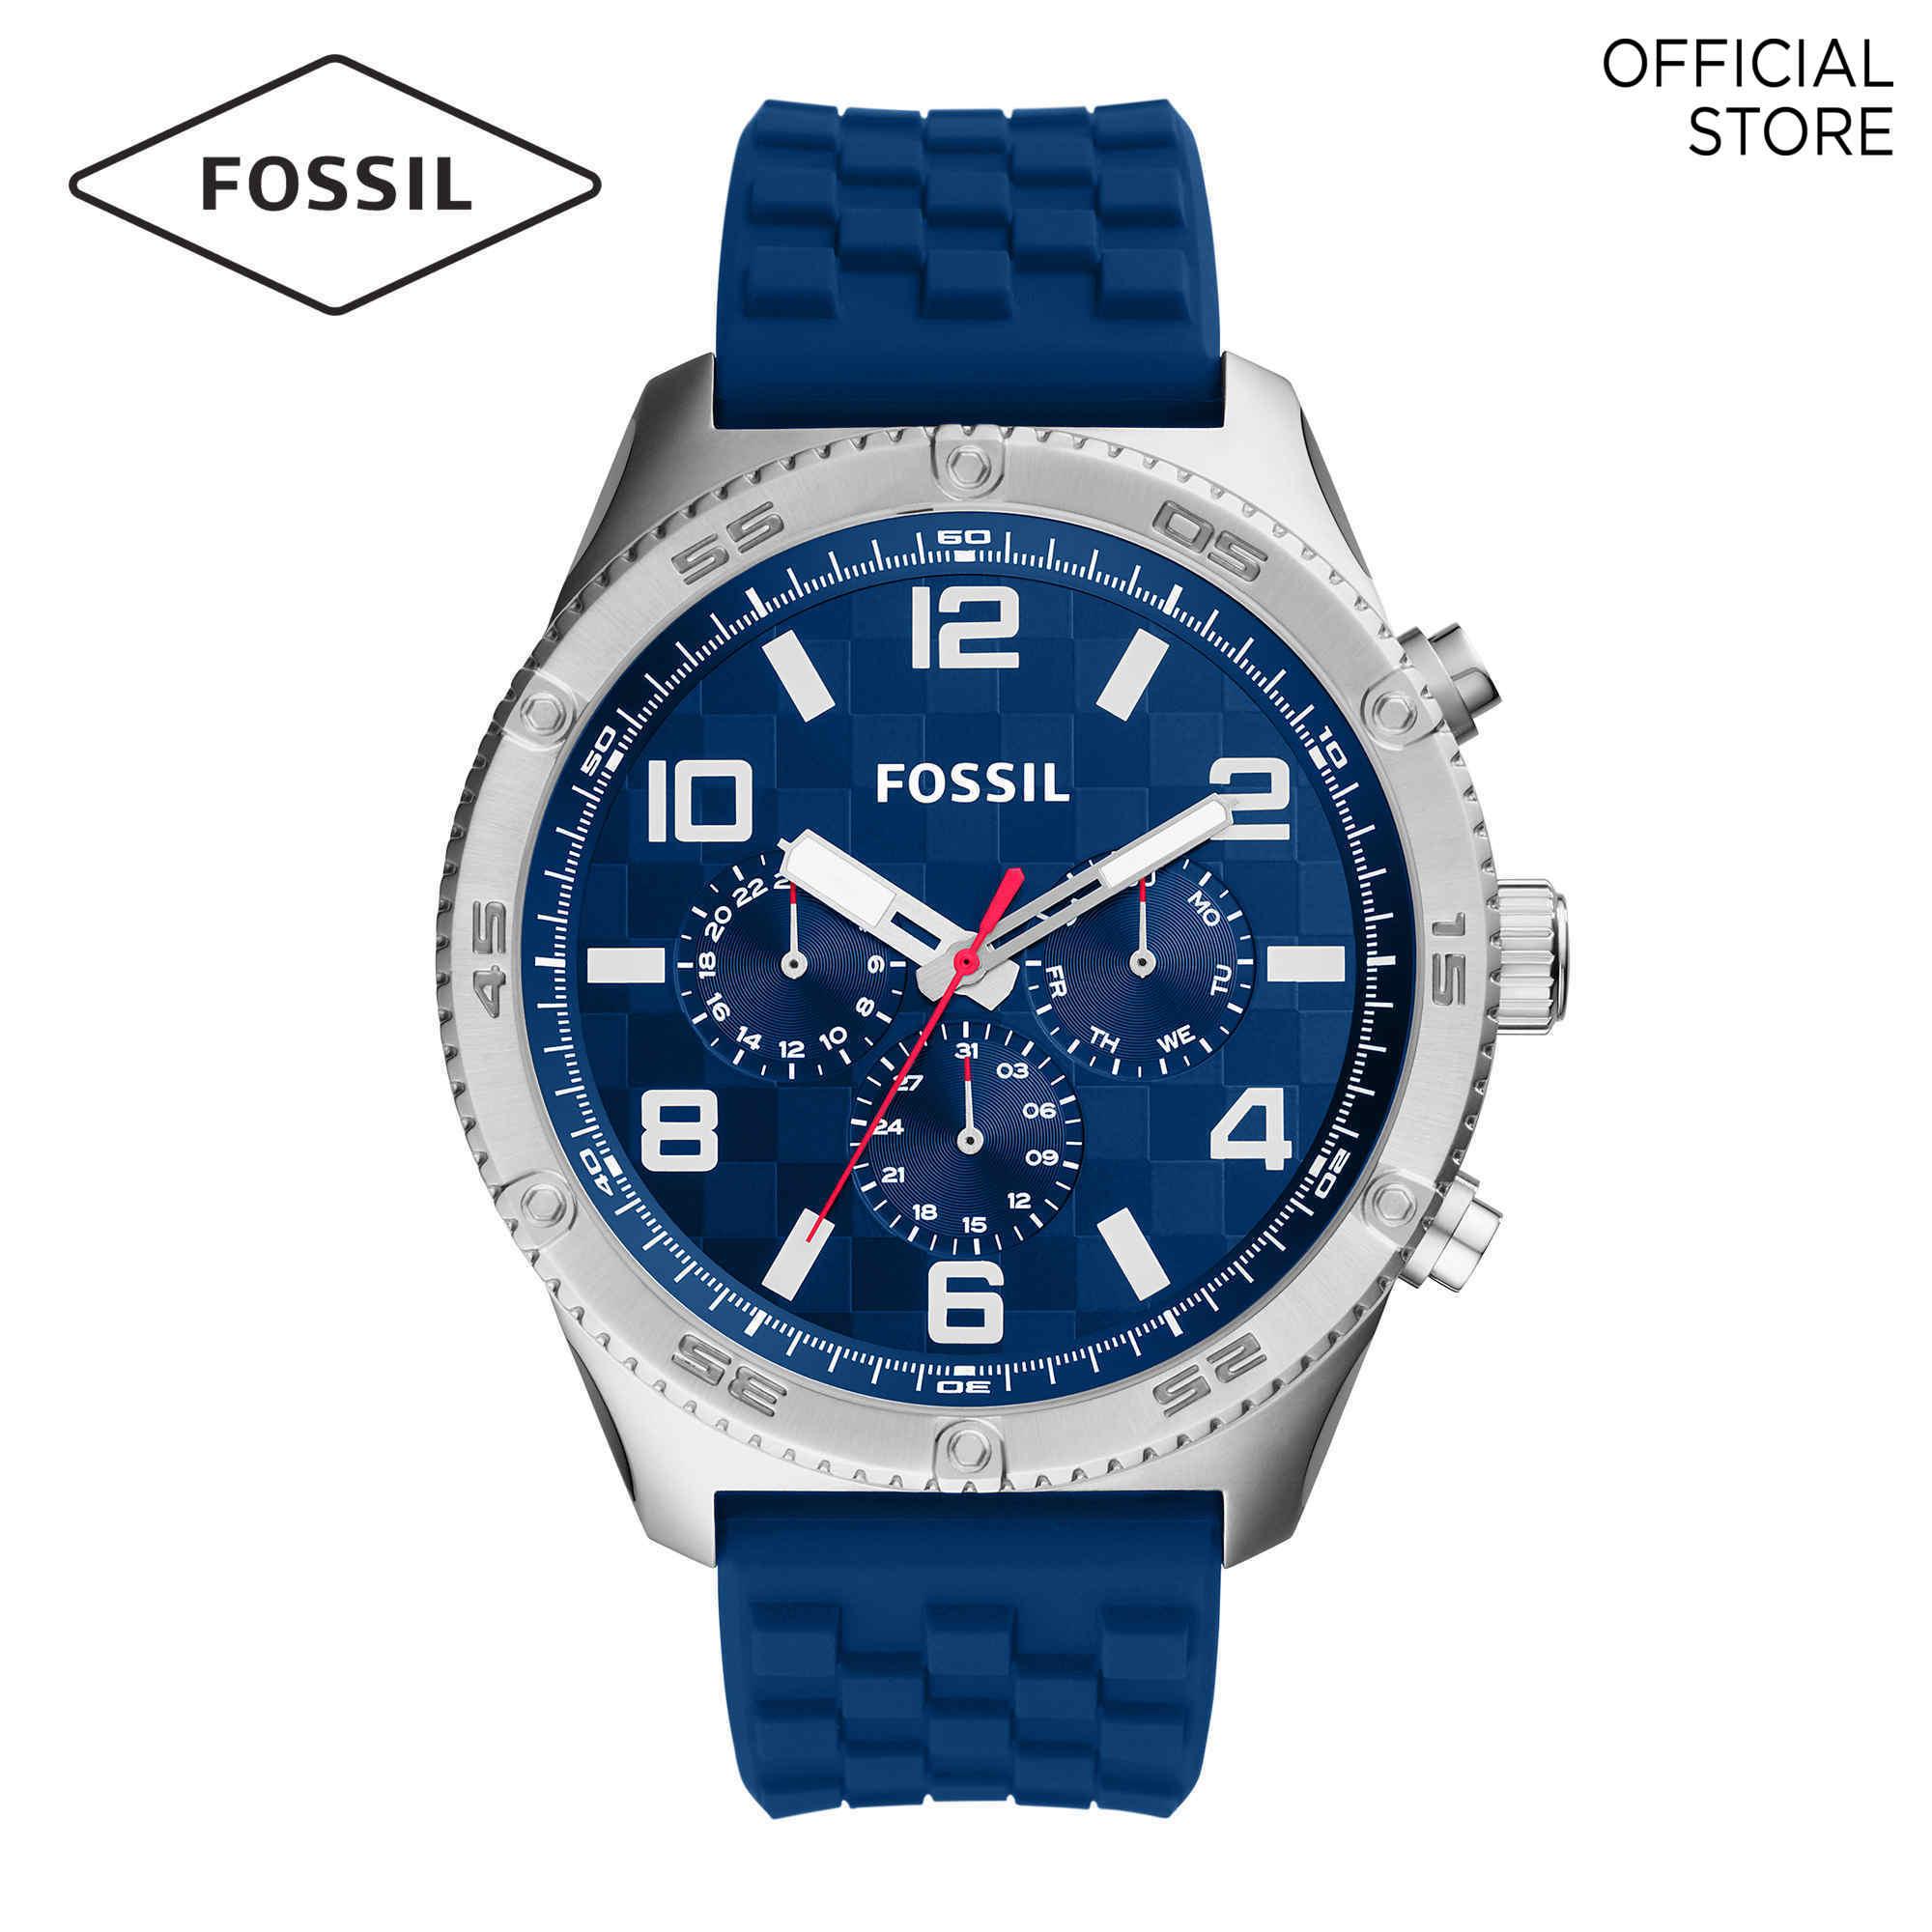 Fossil Brox Blue Watch BQ2558 Malaysia